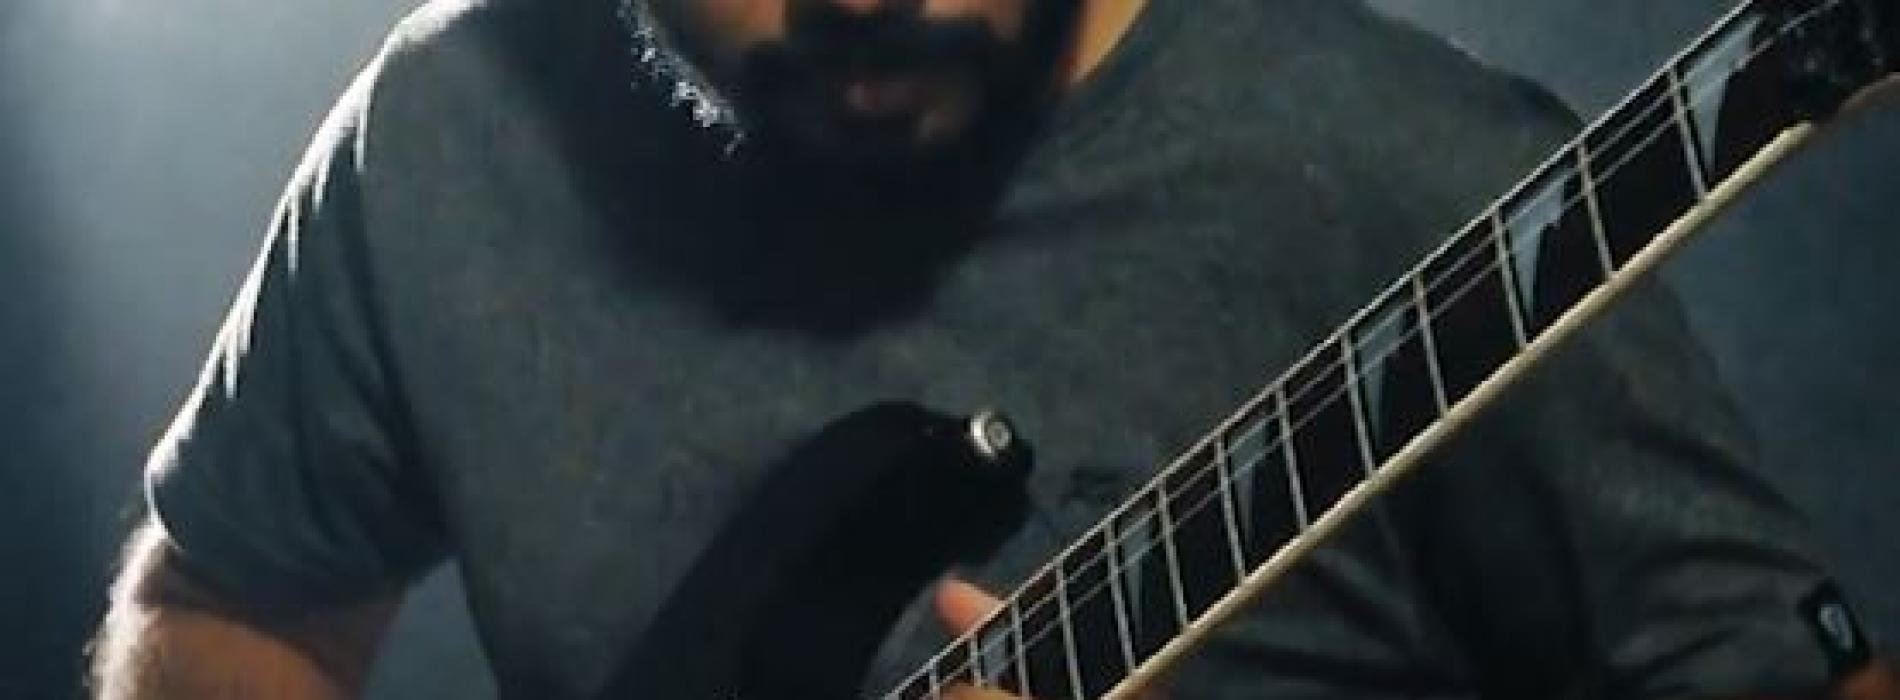 Master Sir | මාස්ටර් සර් – Instrumental Cover By Delaine Silva